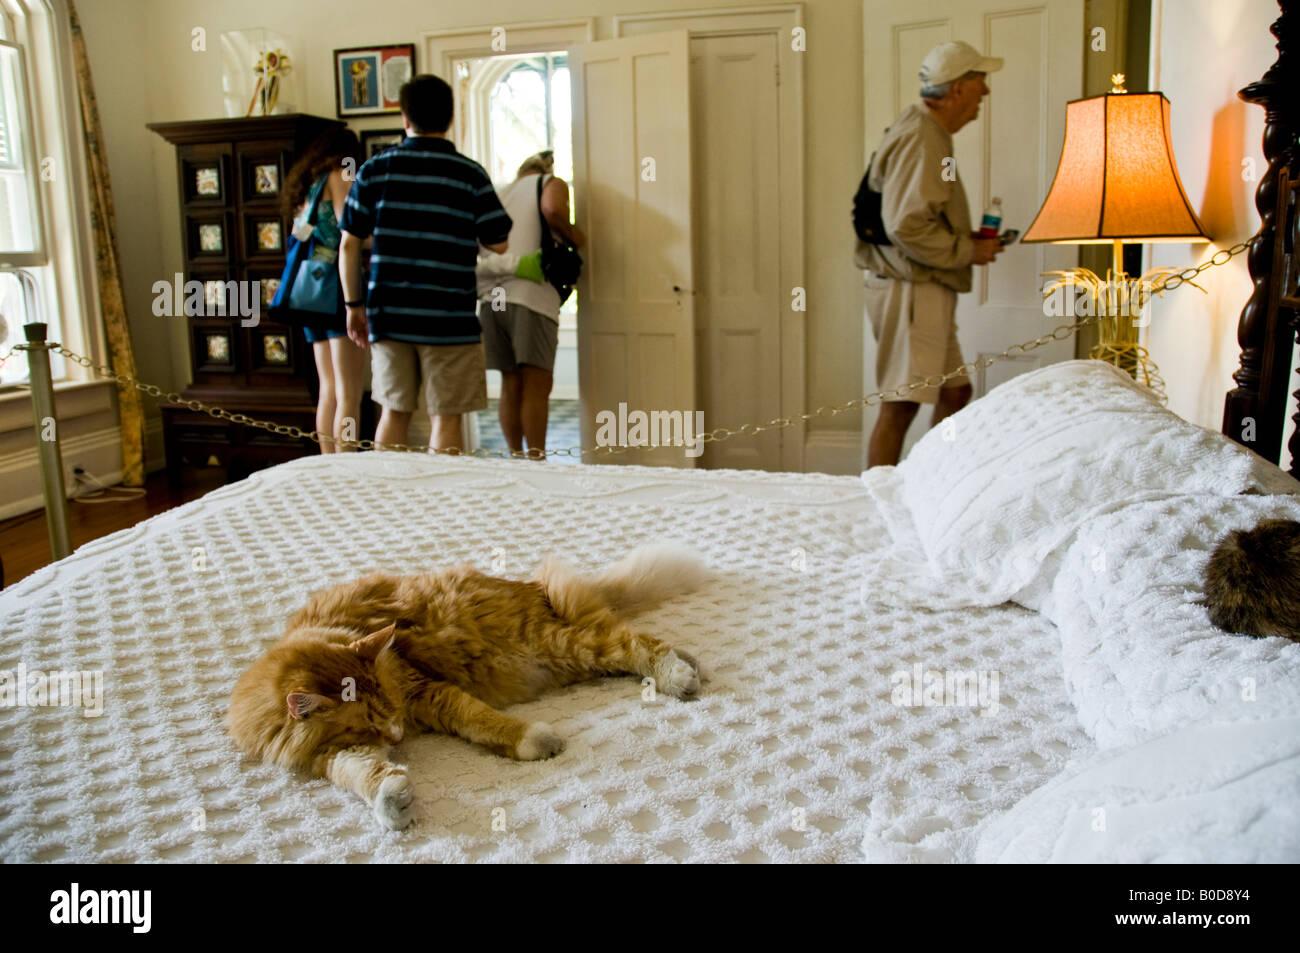 cat bedroom. Cat sleeping on a bed in the master bedroom Ernest Hemingway Home  Key